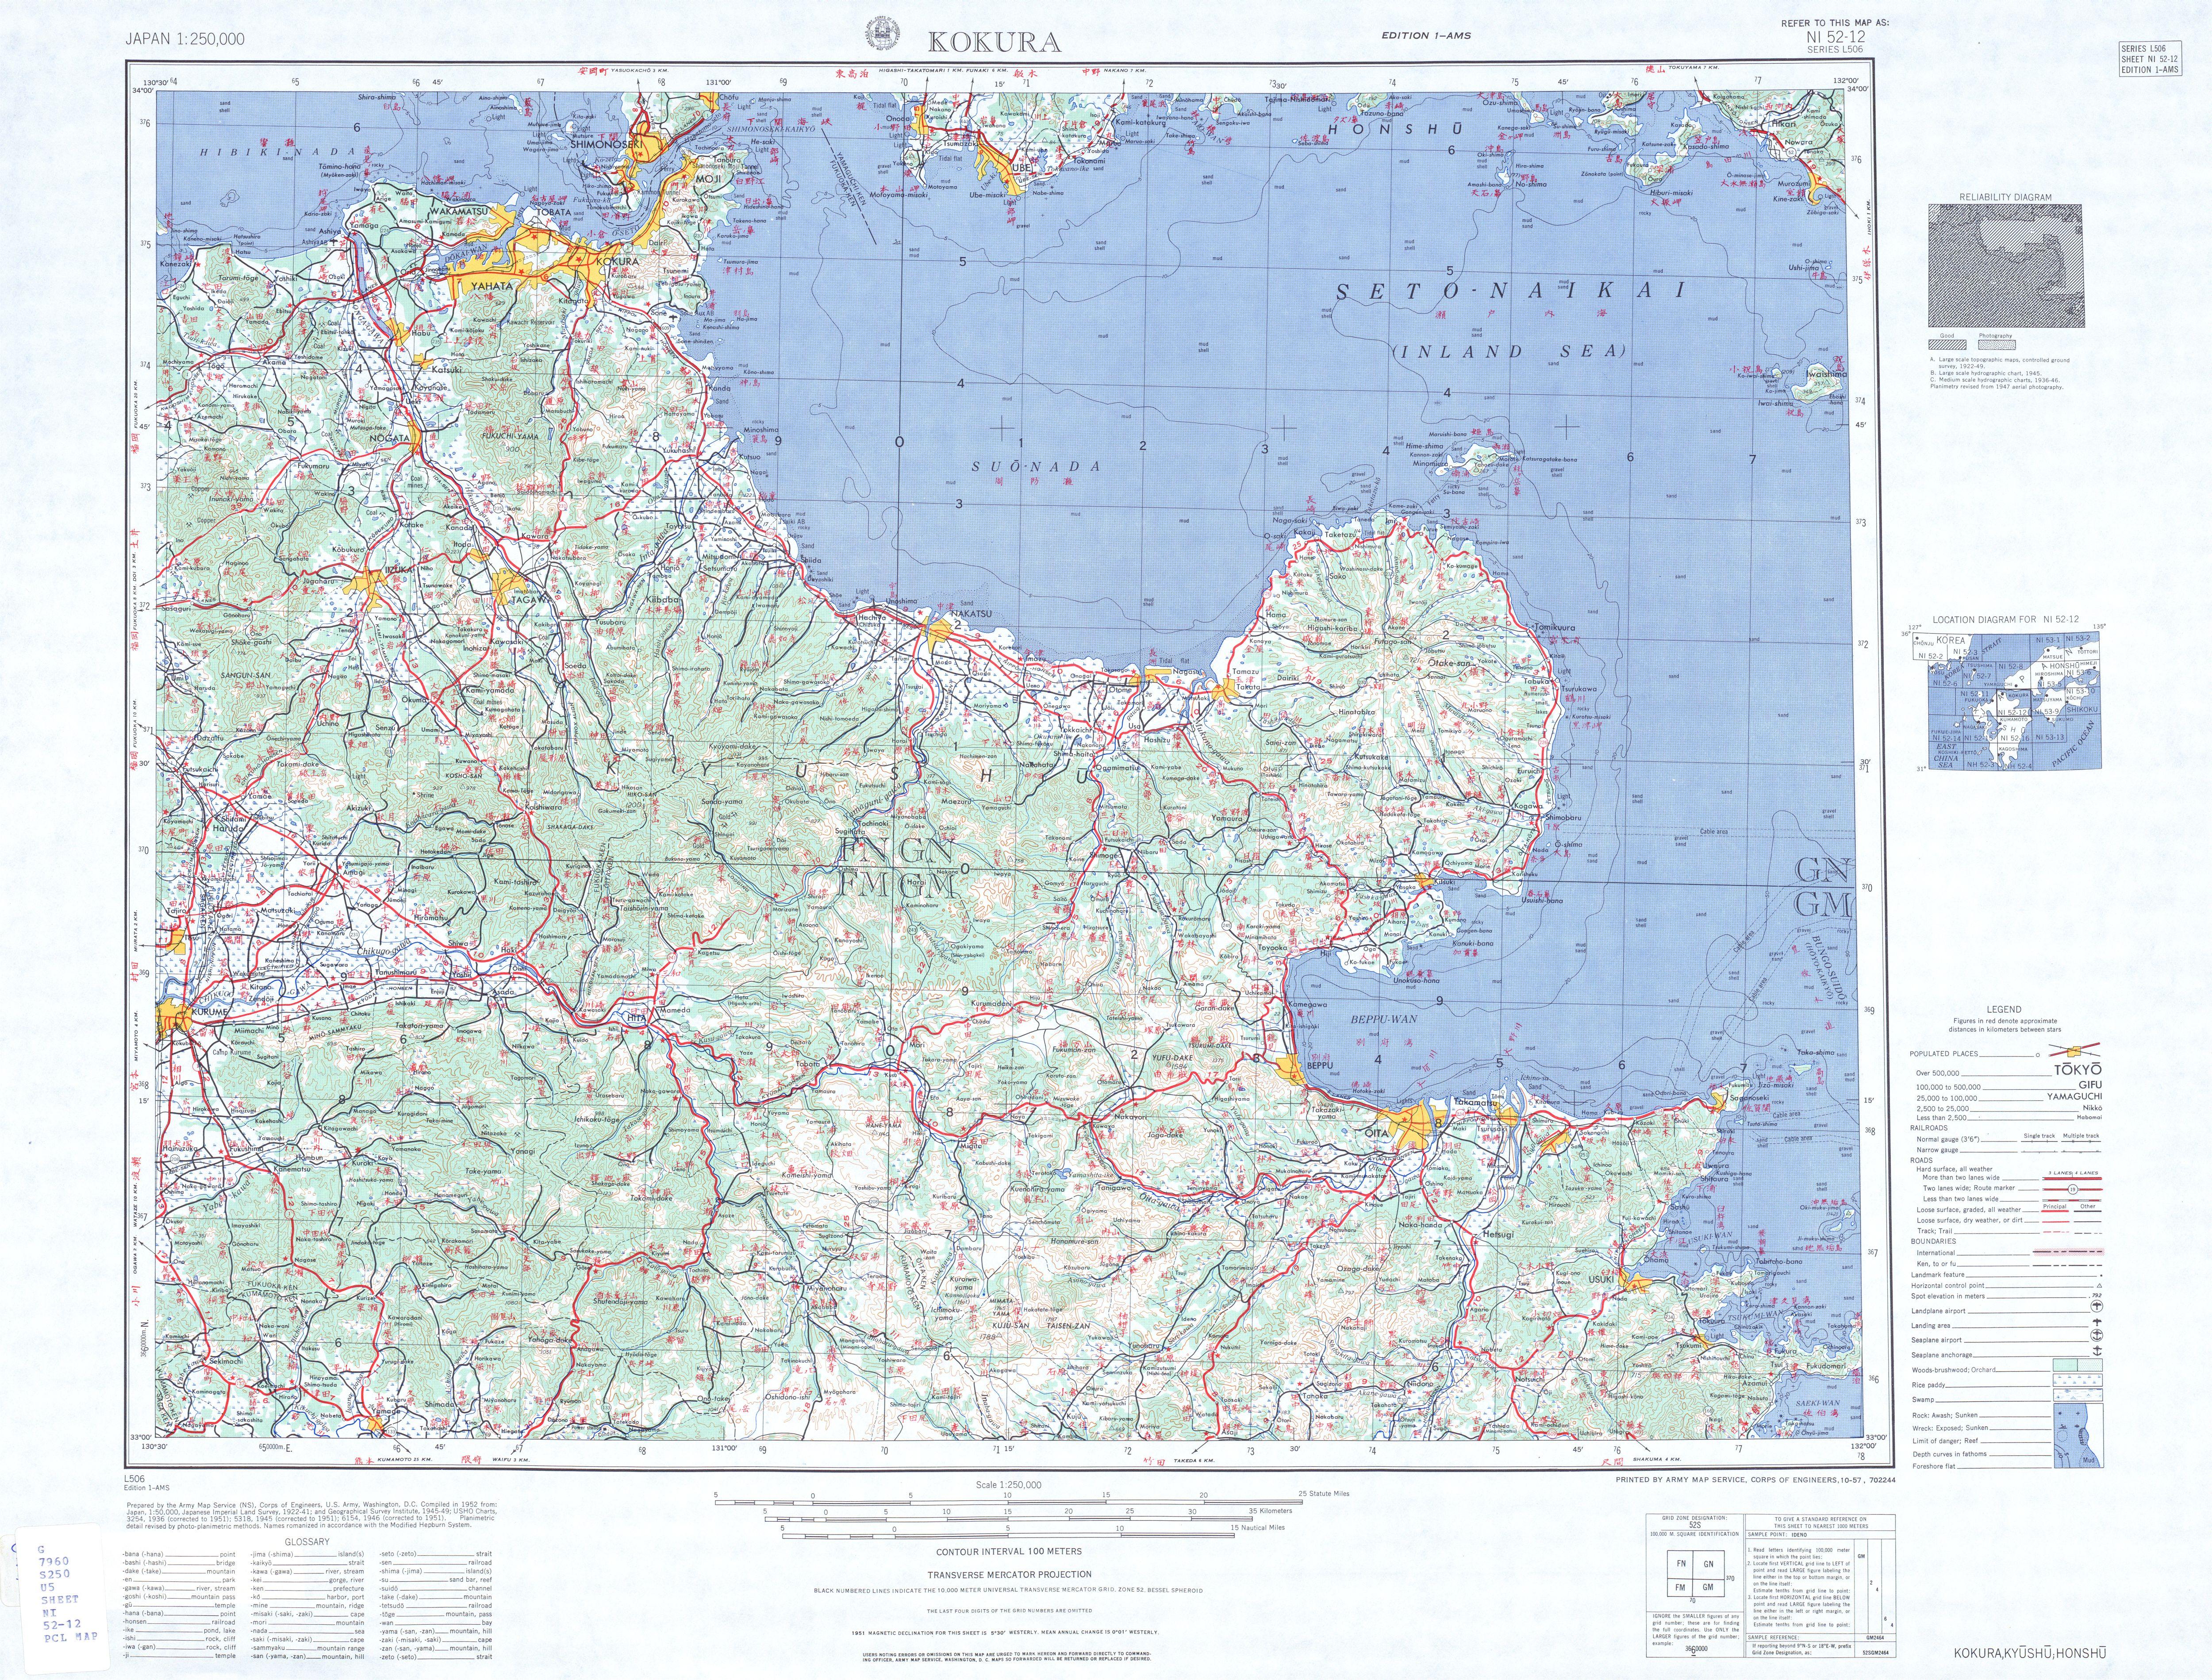 Hoja Kokura del Mapa Topográfico de Japón 1954